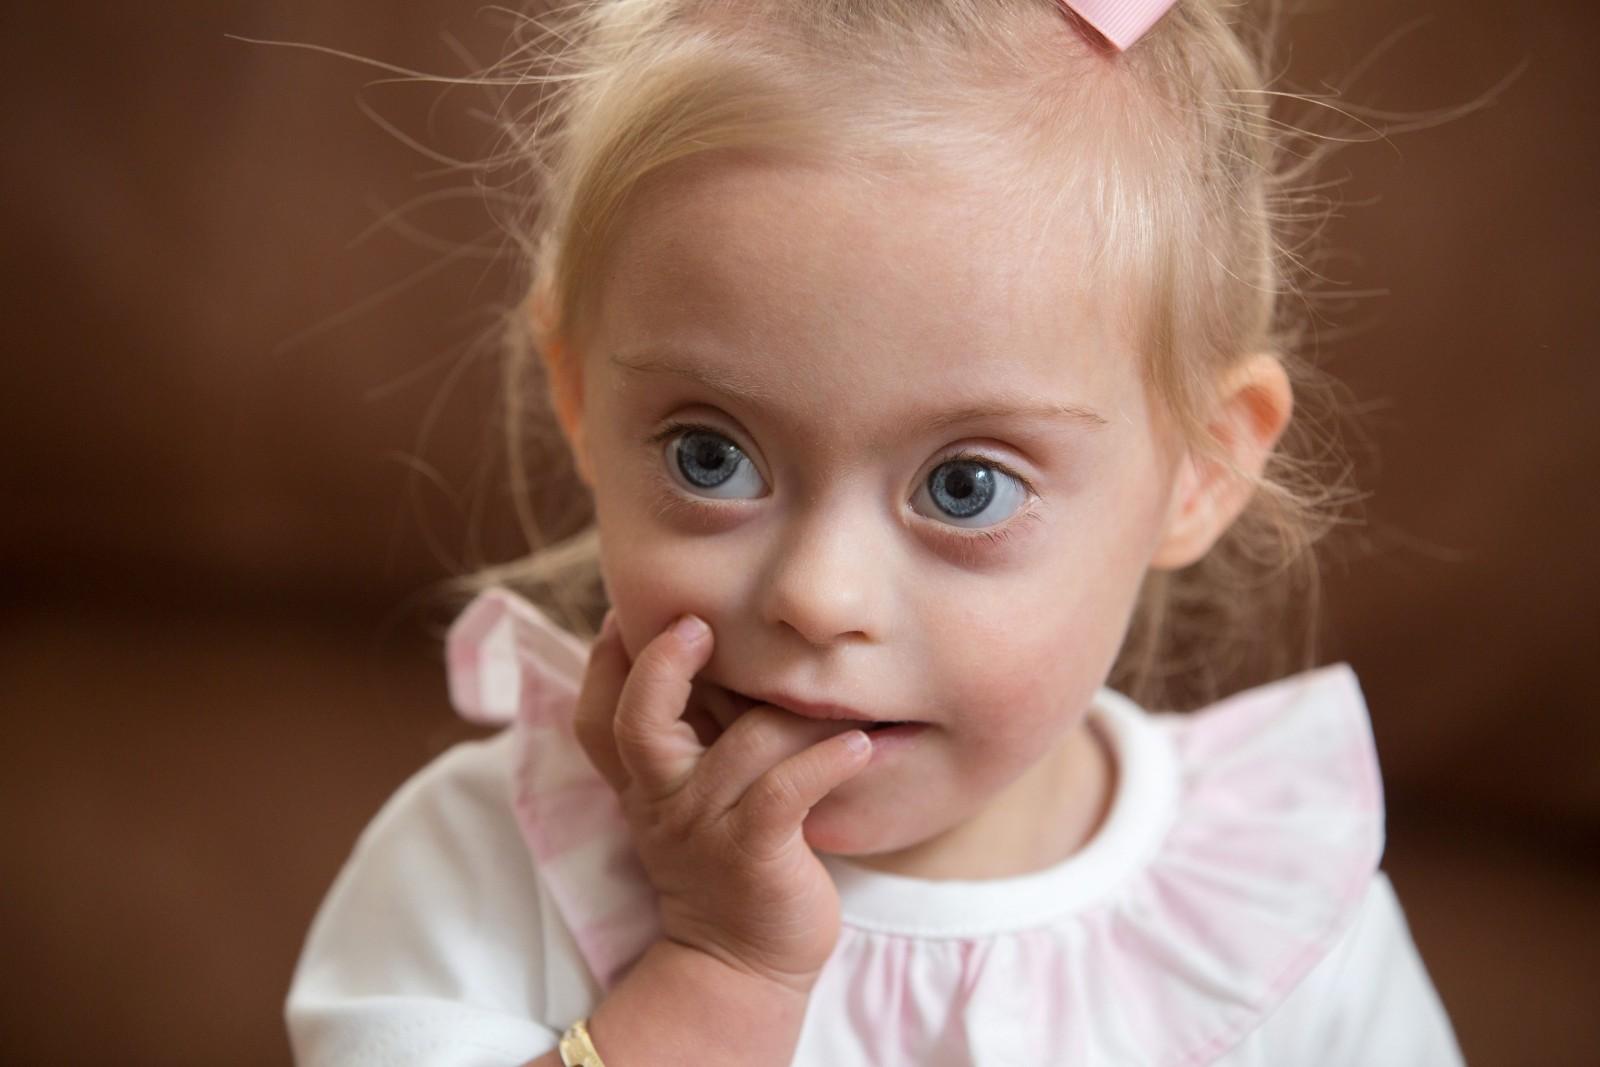 Детей с сочетанием аутизма и синдрома Дауна